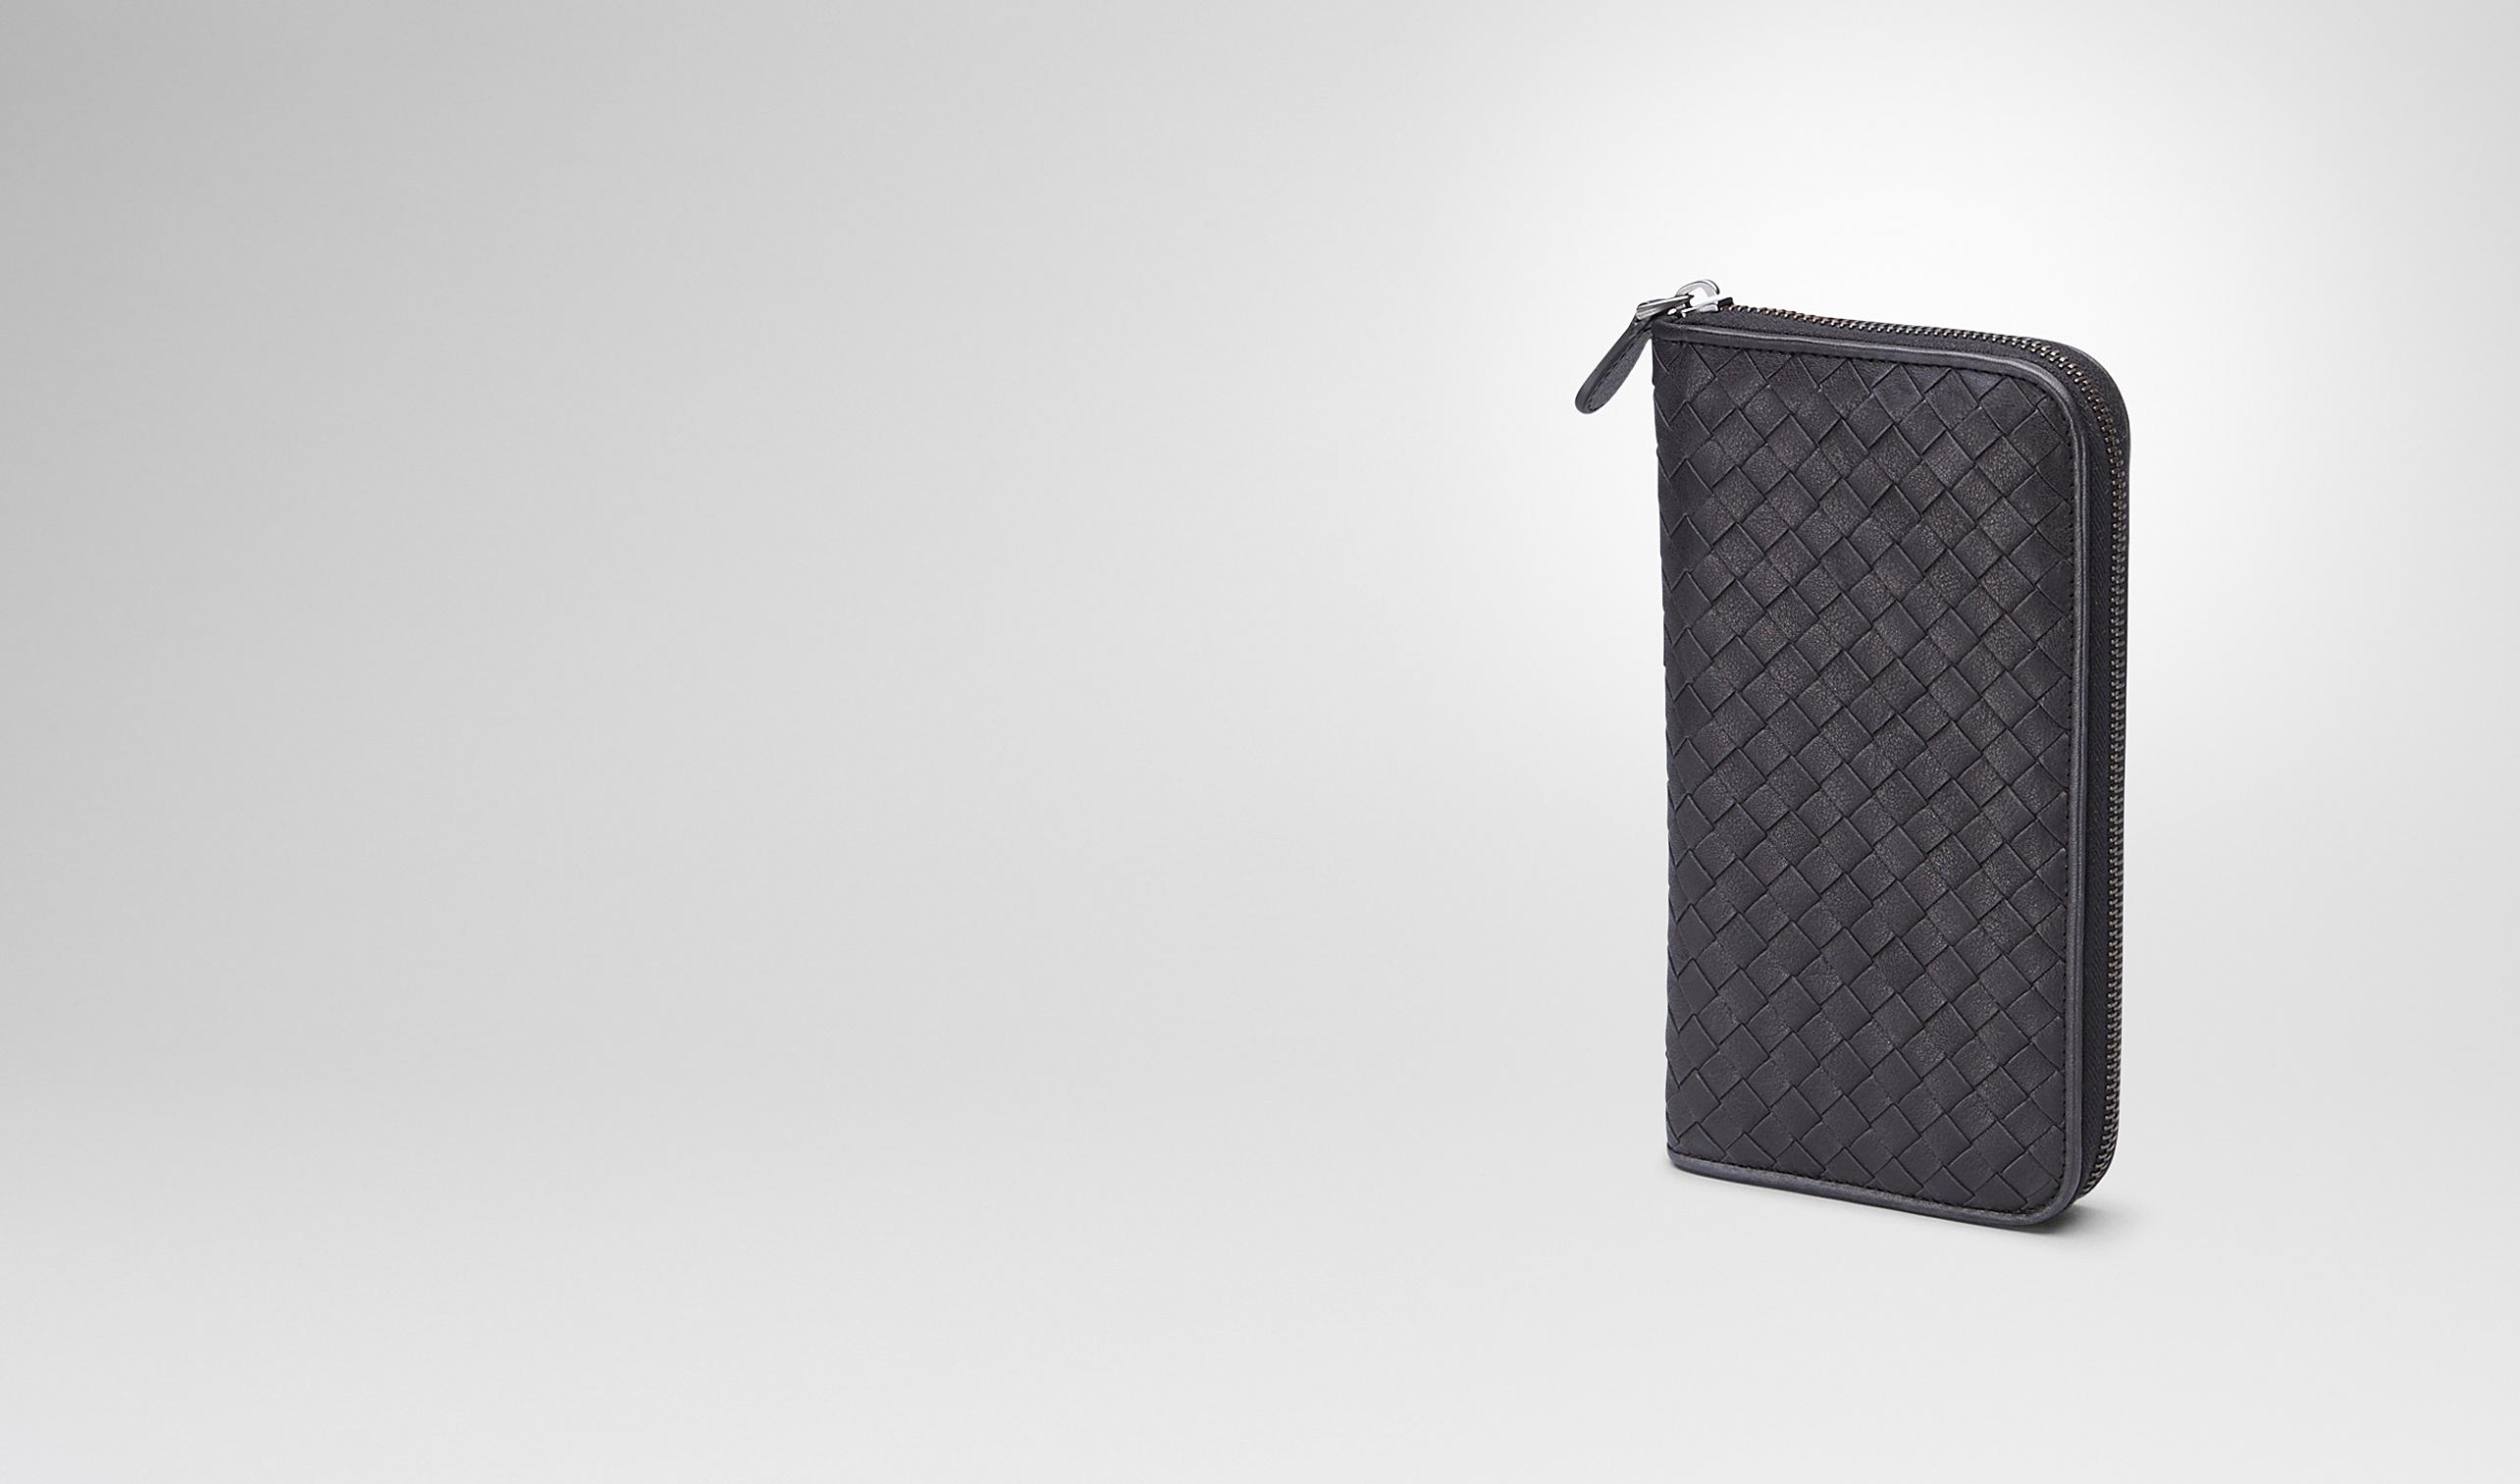 BOTTEGA VENETA Zip Around Wallet U Nero Signal Blue Intrecciato Washed Vintage Zip Around Wallet pl